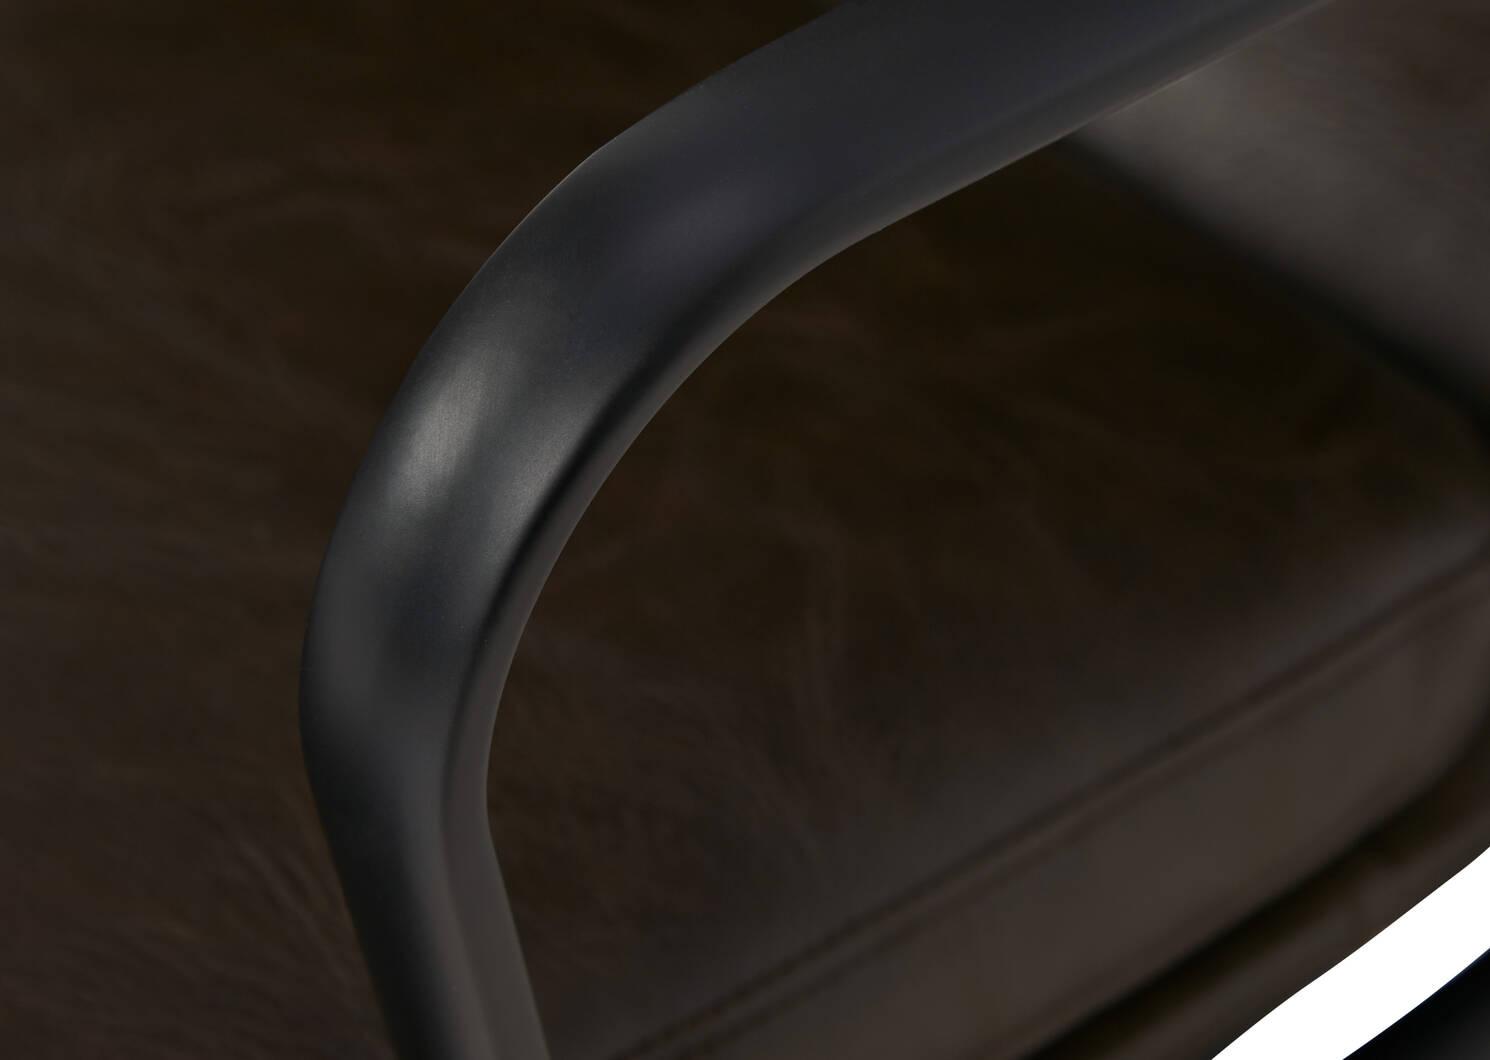 Fauteuil de bureau Handler -Wyeth brun